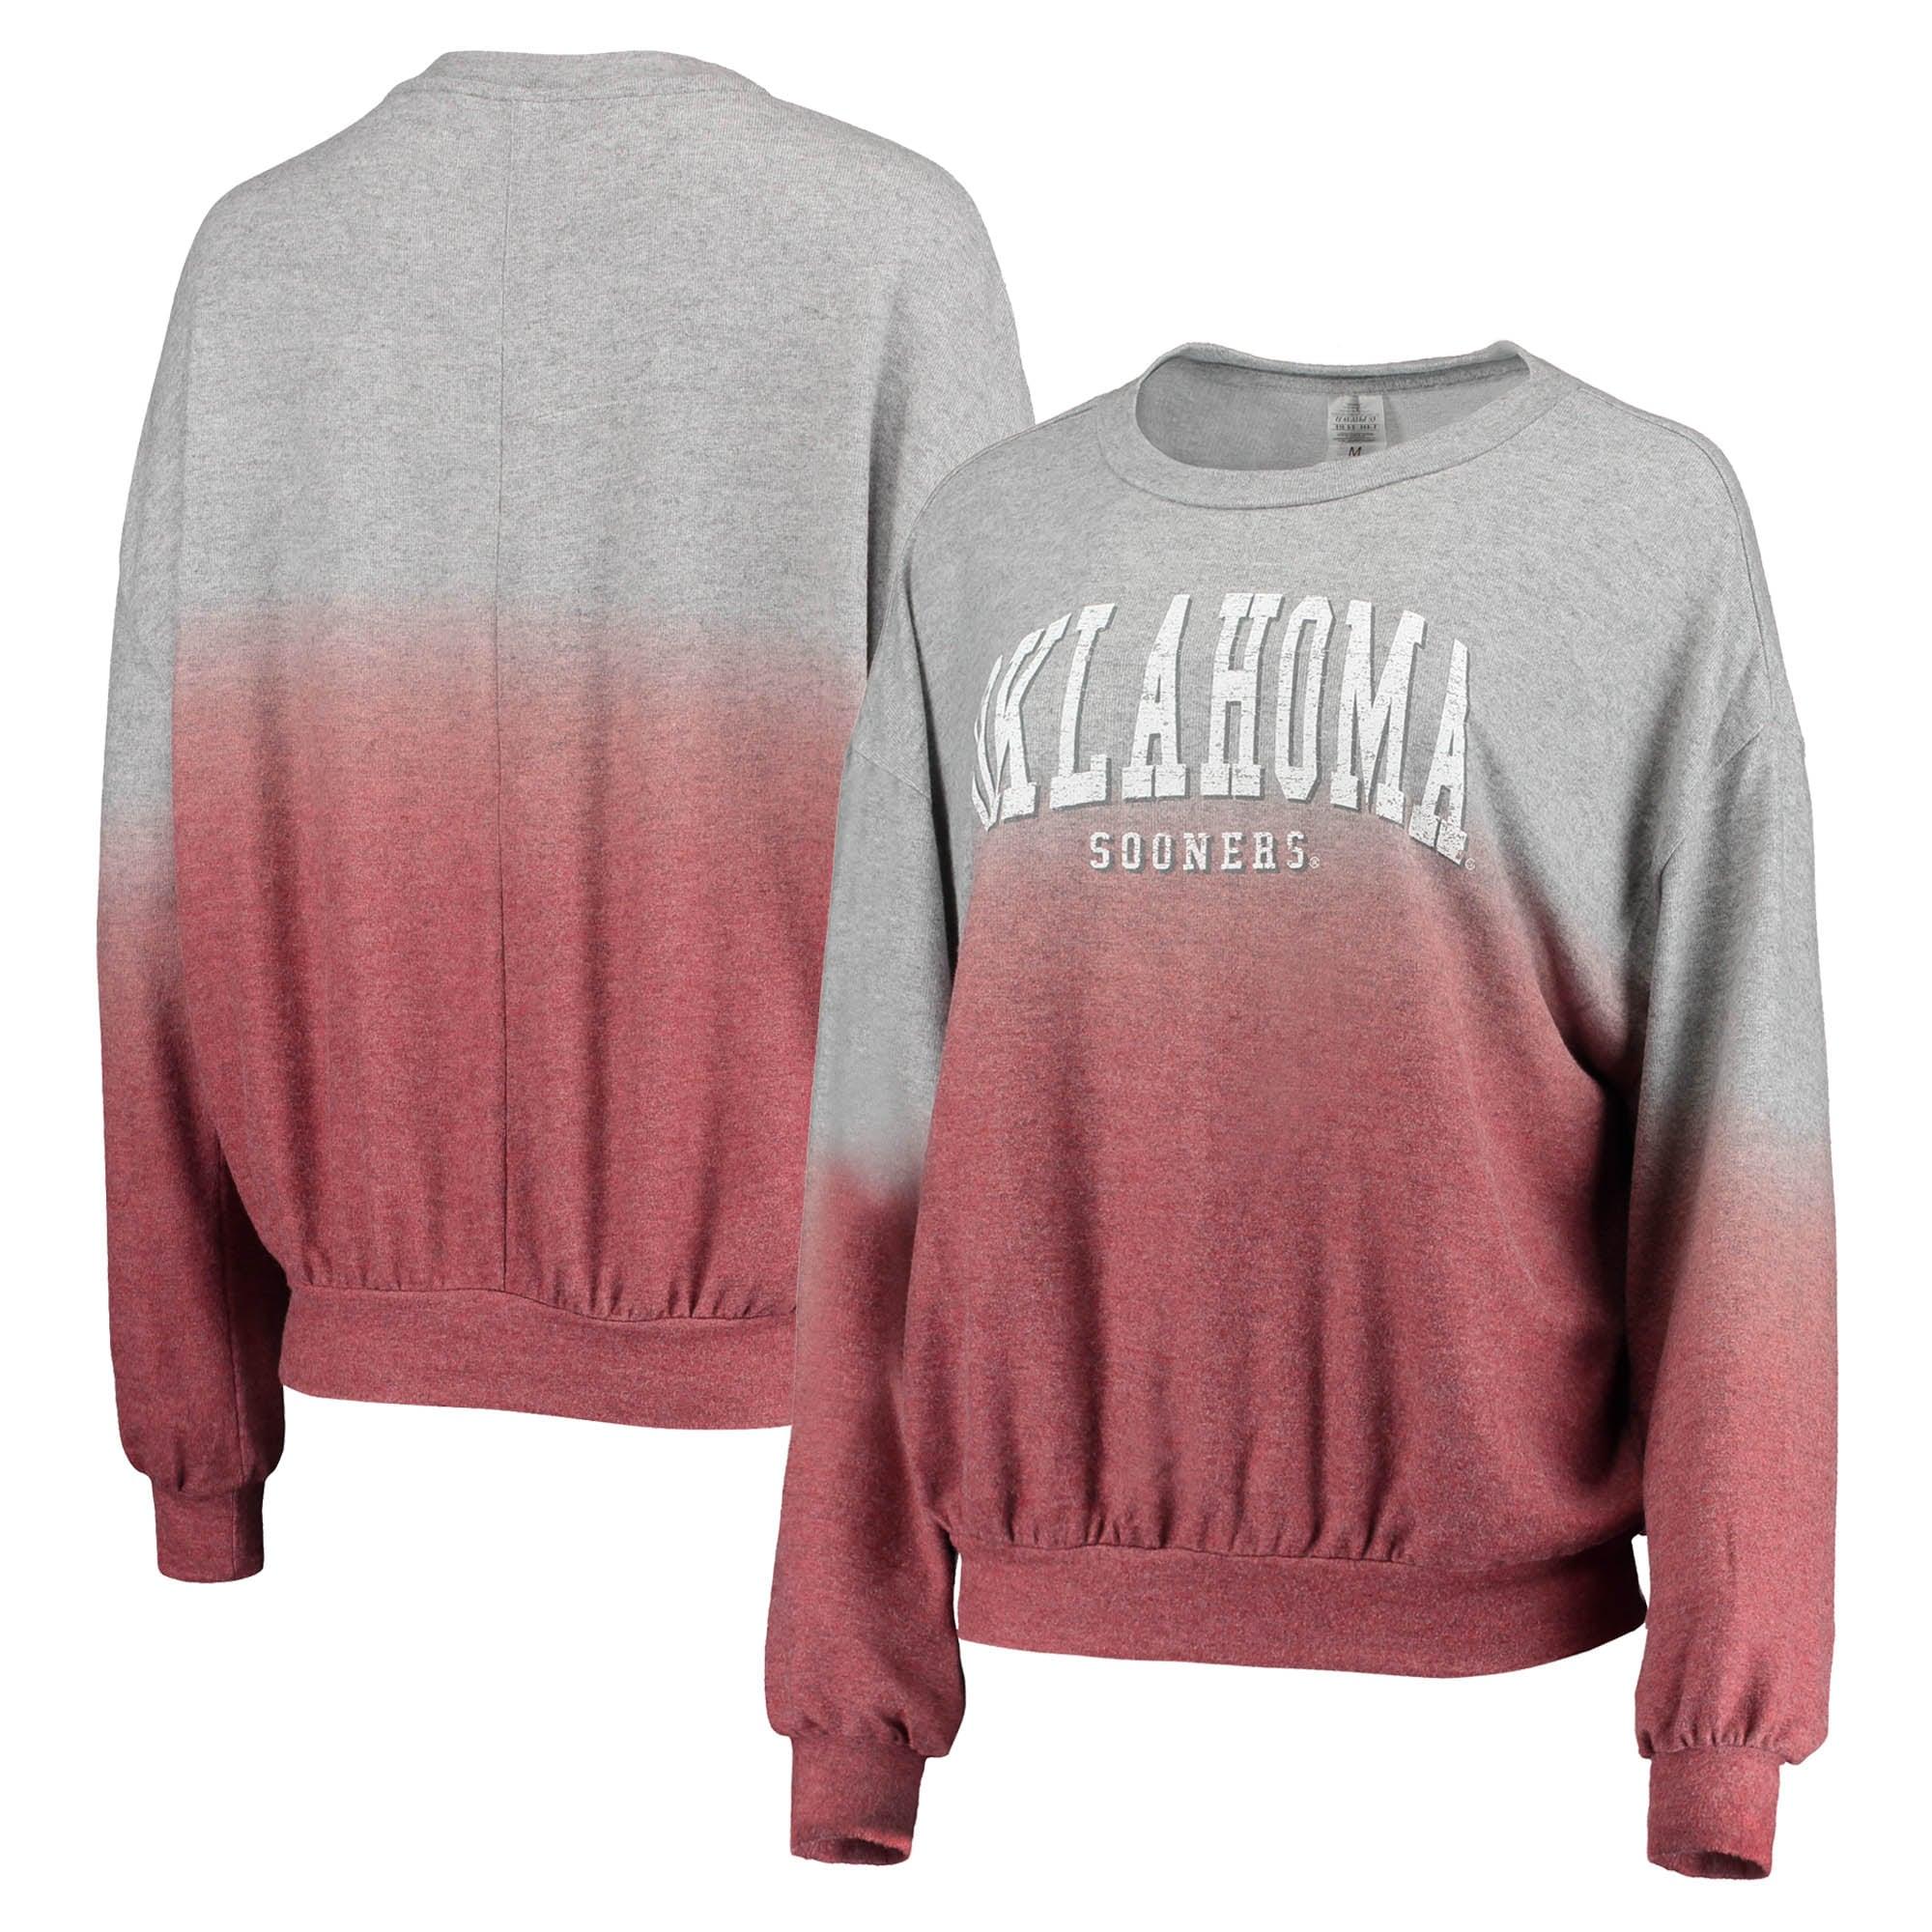 Oklahoma Sooners Gameday Couture Women's Slow Fade Hacci Ombre Pullover Sweatshirt - Crimson/Gray